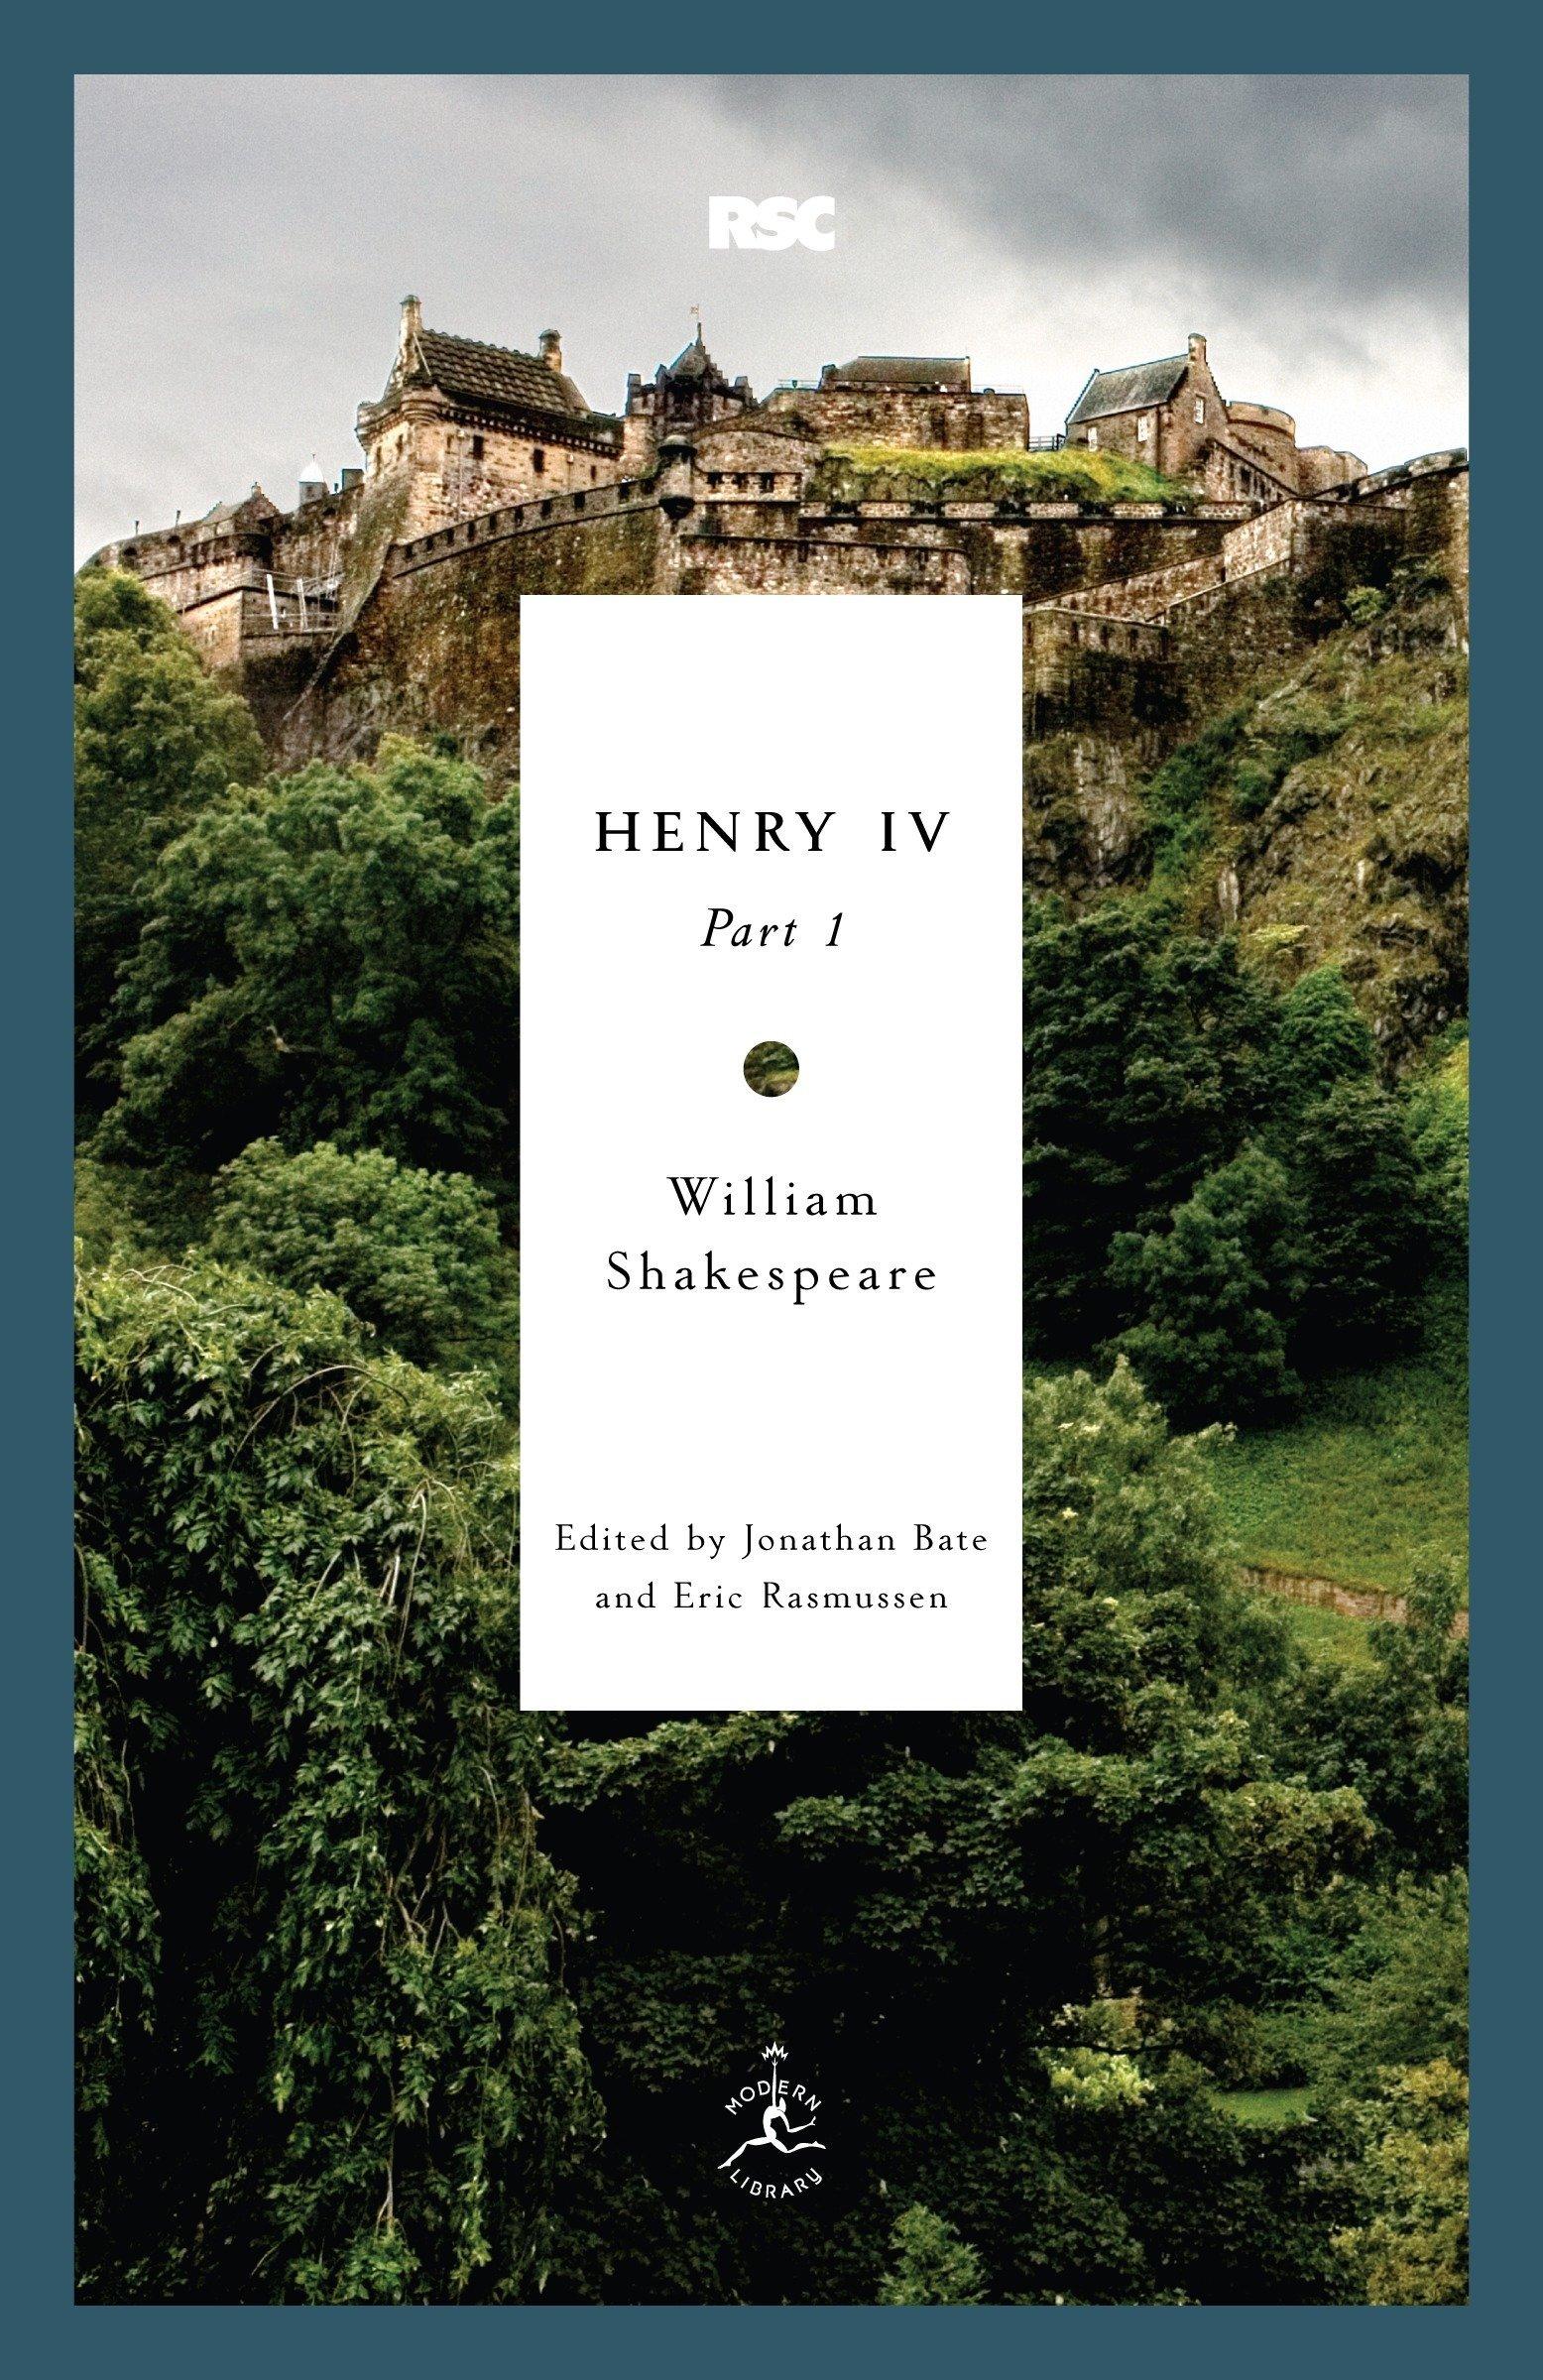 Henry IV, Part 1 (Modern Library Classics (Paperback)): Amazon.co.uk: William  Shakespeare, Professor of Shakespeare and Renaissance Literature Jonathan  Bate ...